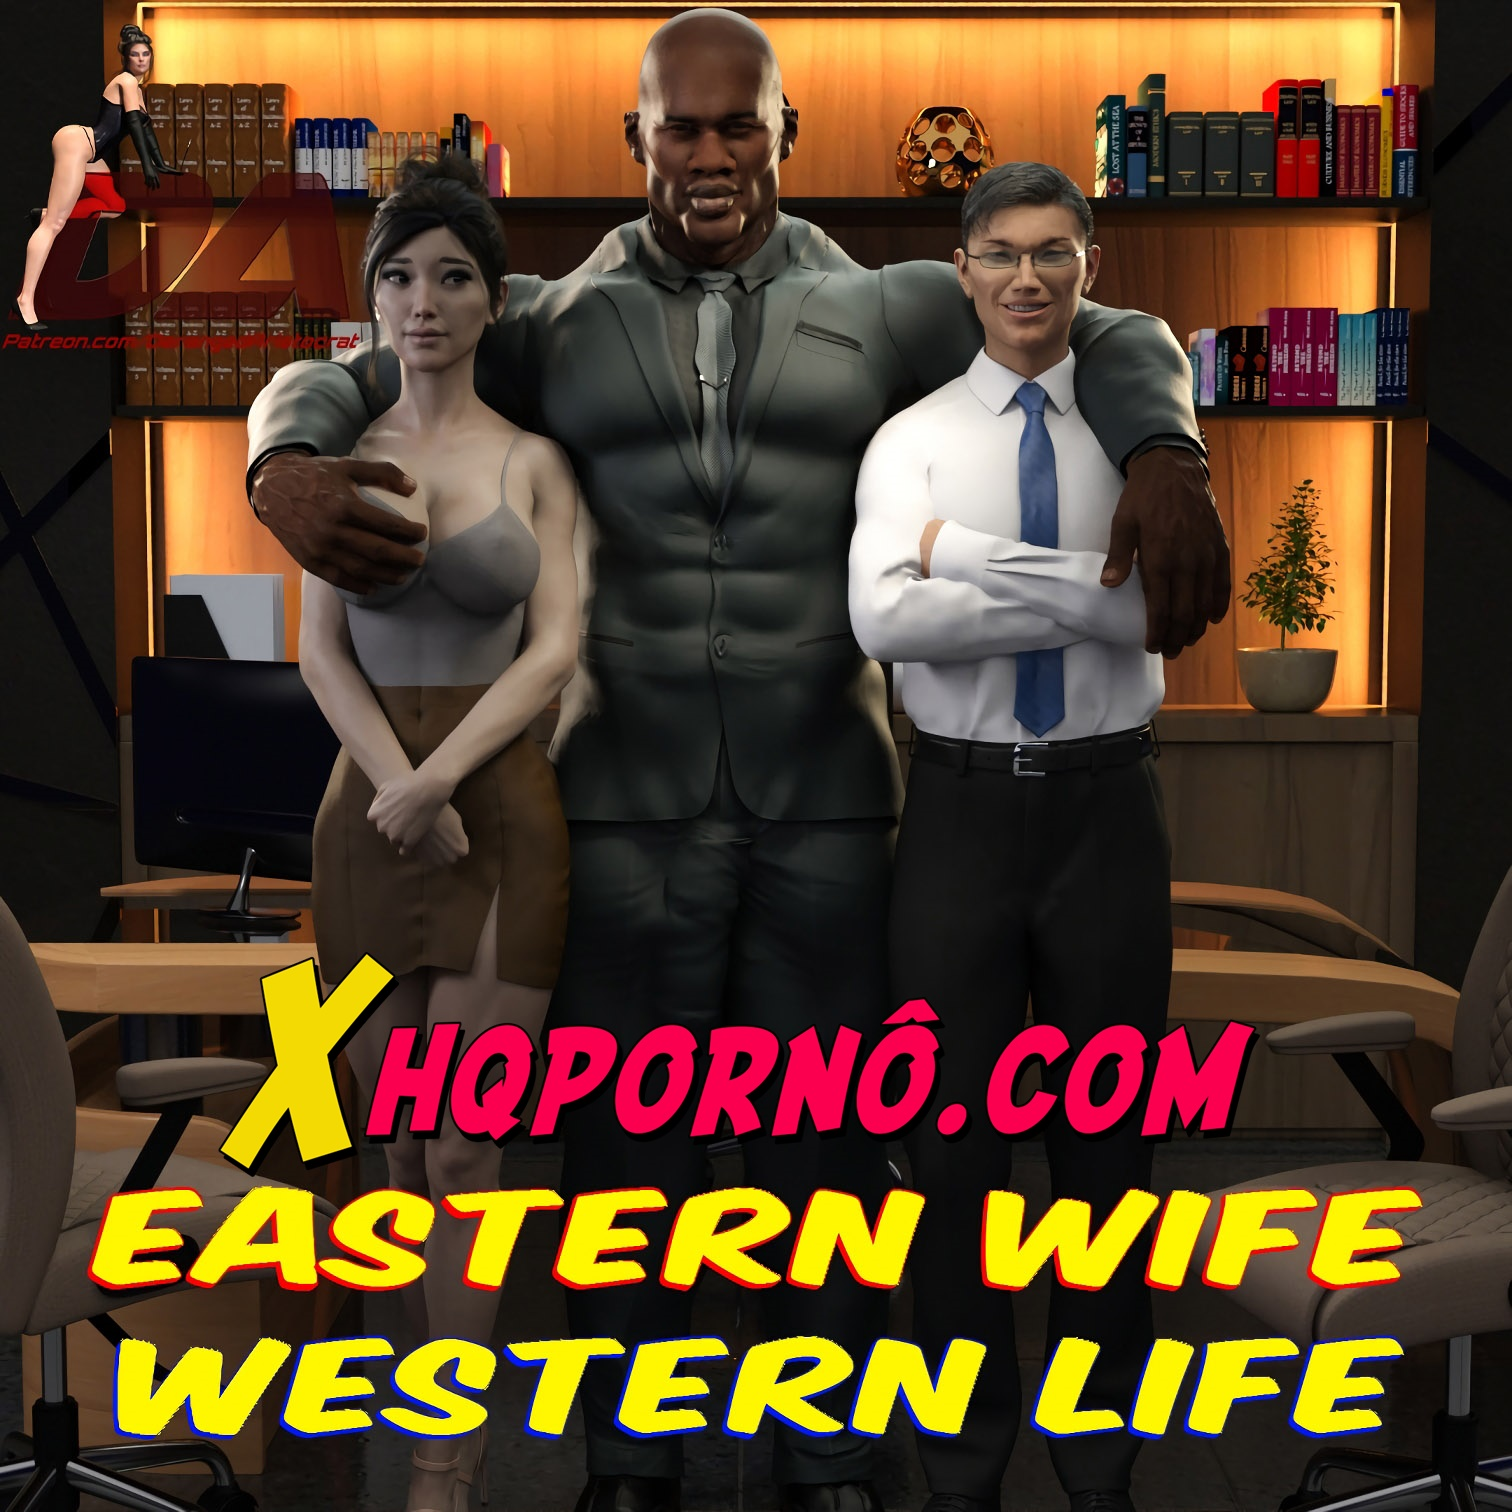 Esposa Oriental vida Ocidental 1